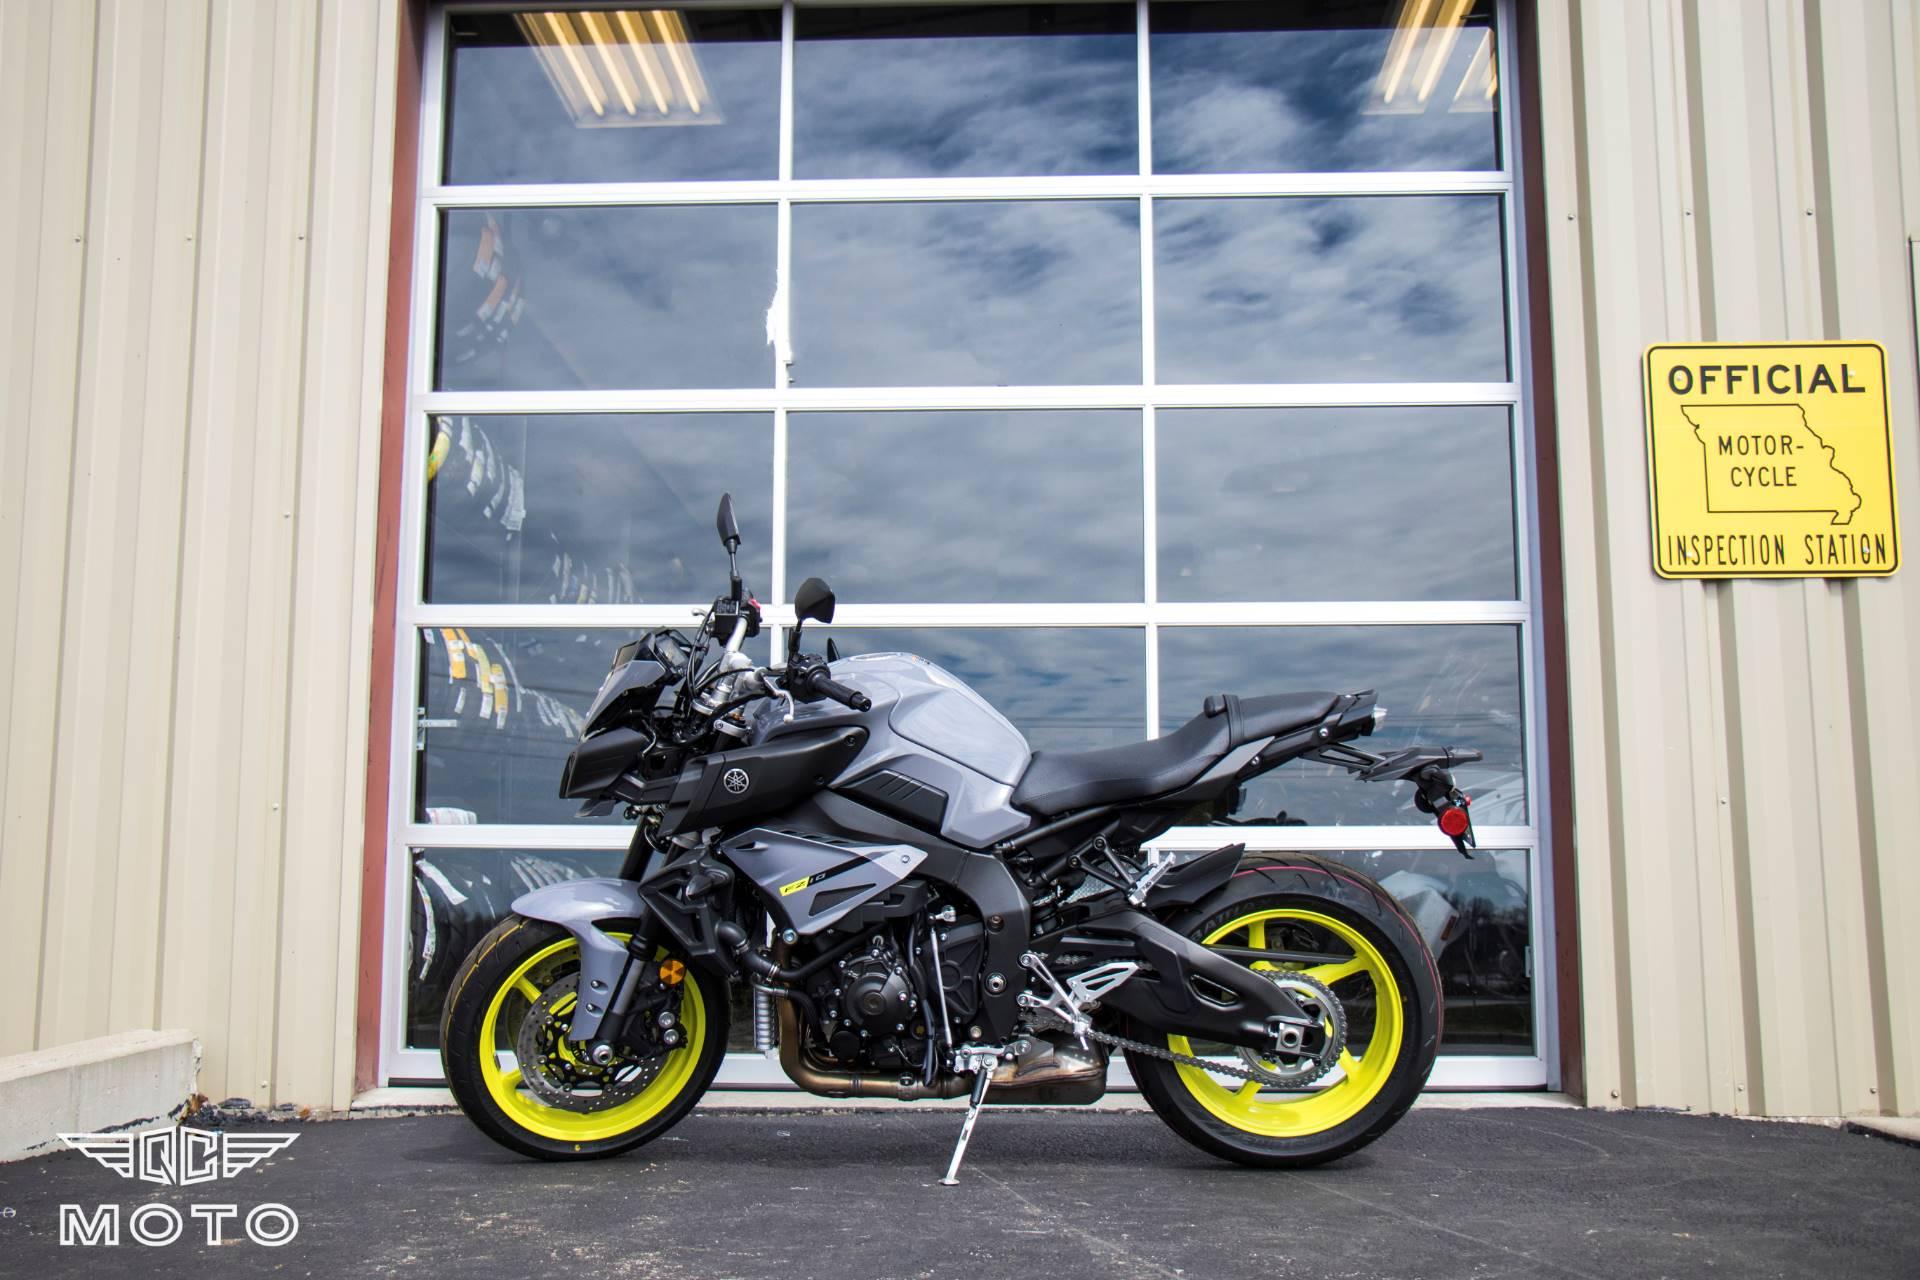 New 2017 yamaha fz 10 motorcycles in springfield mo for Yamaha credit card phone number